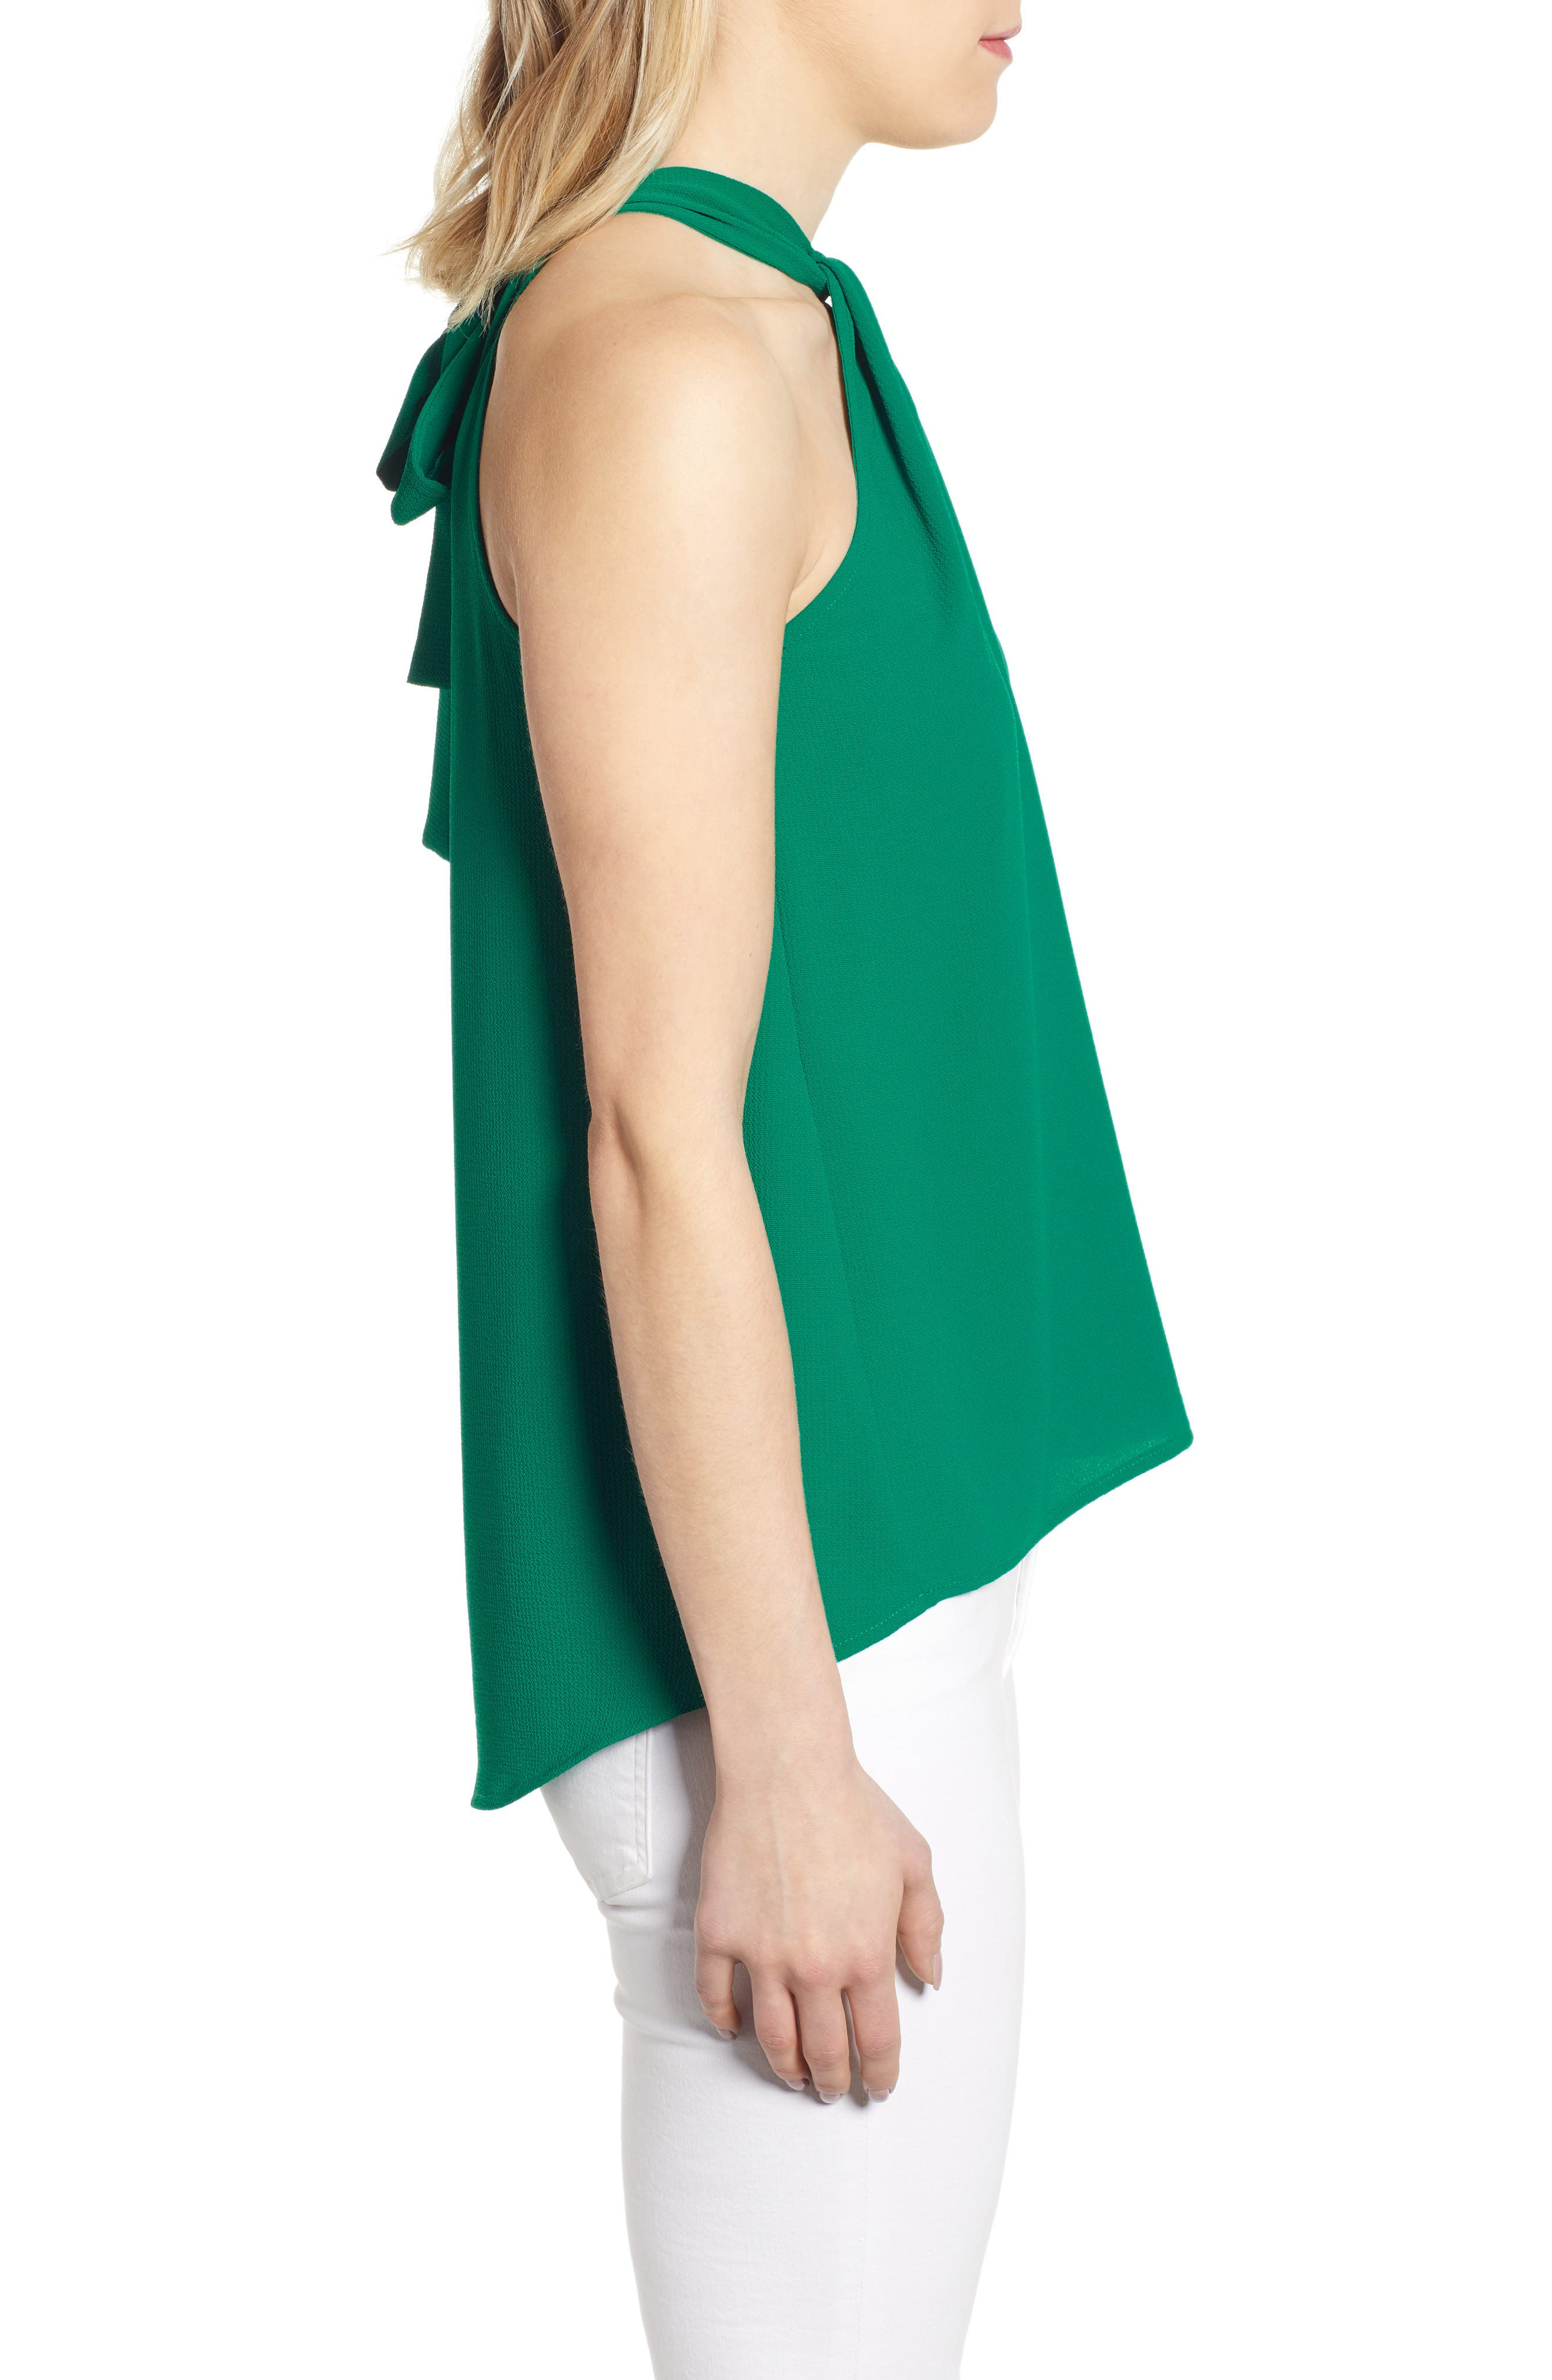 GIBSON,                             x International Women's Day Chelsea Halter Neck Date Top,                             Alternate thumbnail 3, color,                             GREEN